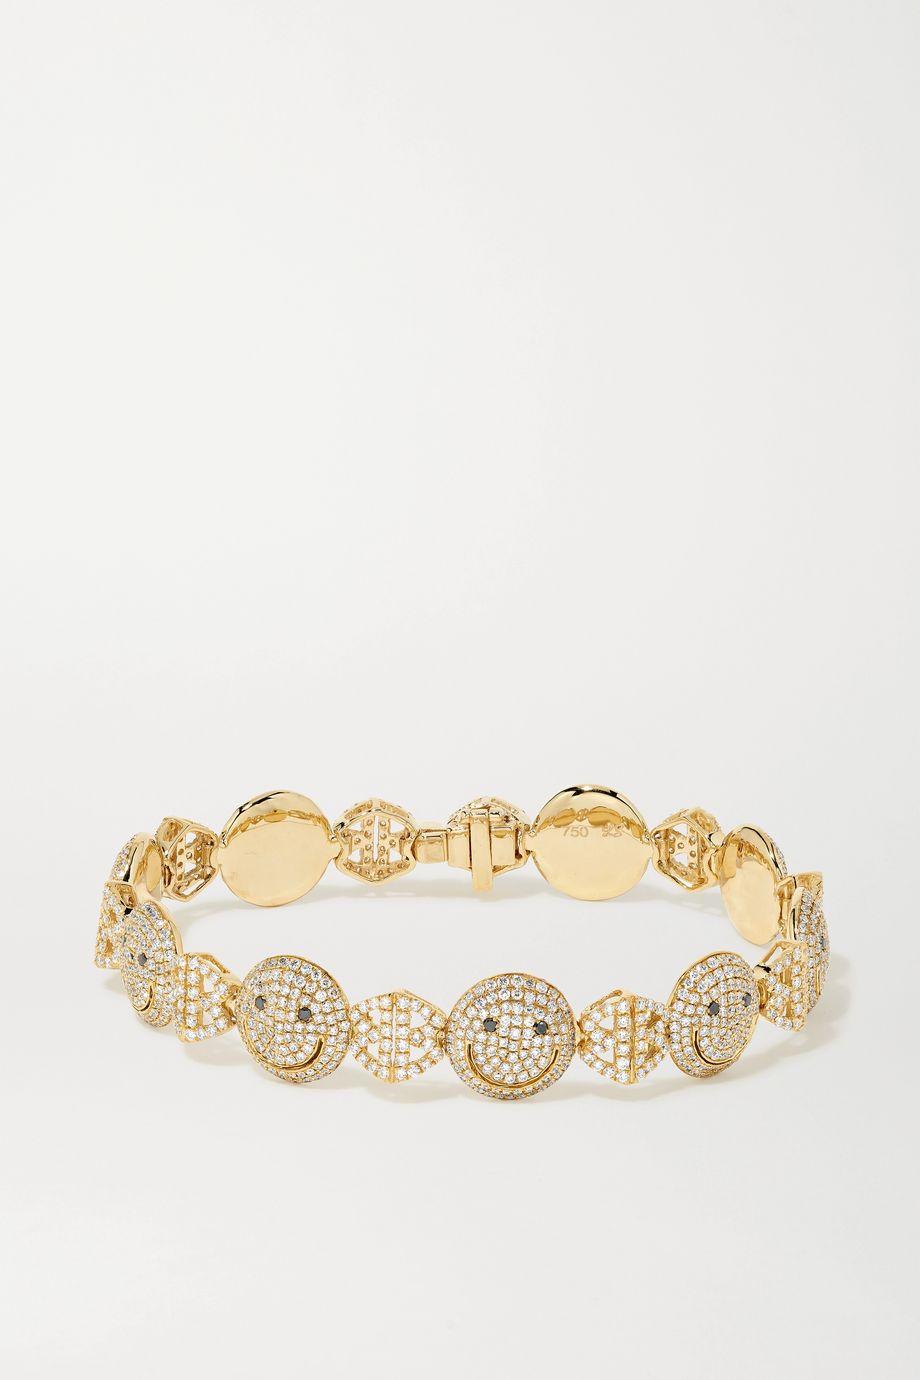 Lorraine Schwartz 18-karat gold diamond bracelet